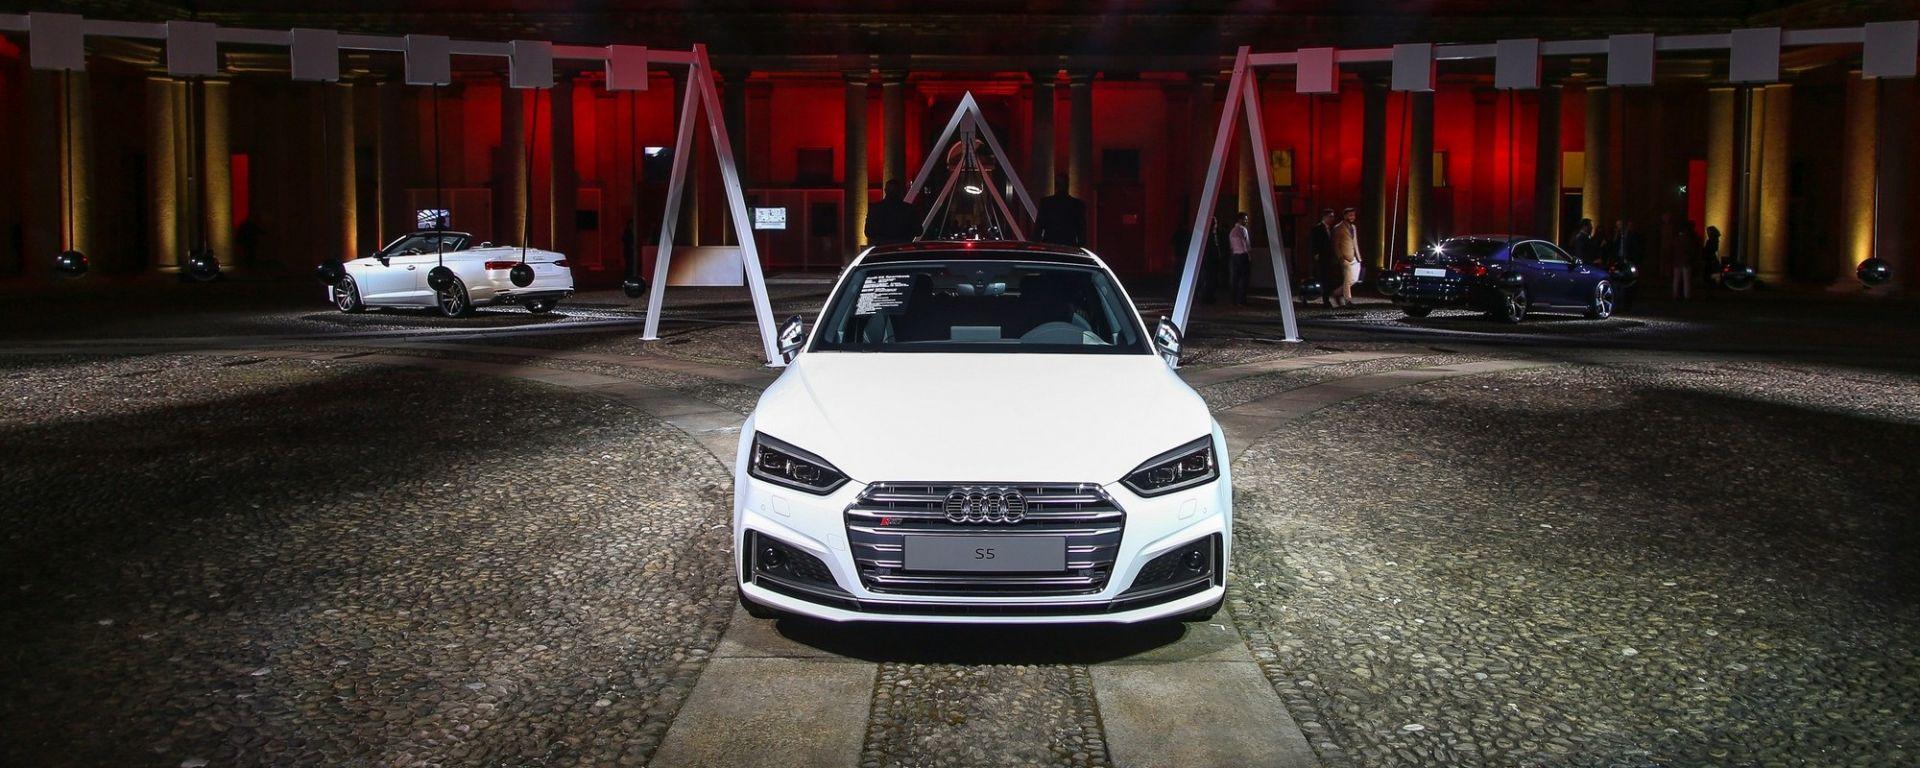 Audi City Lab: S5 Cabriolet in anteprima nazionale